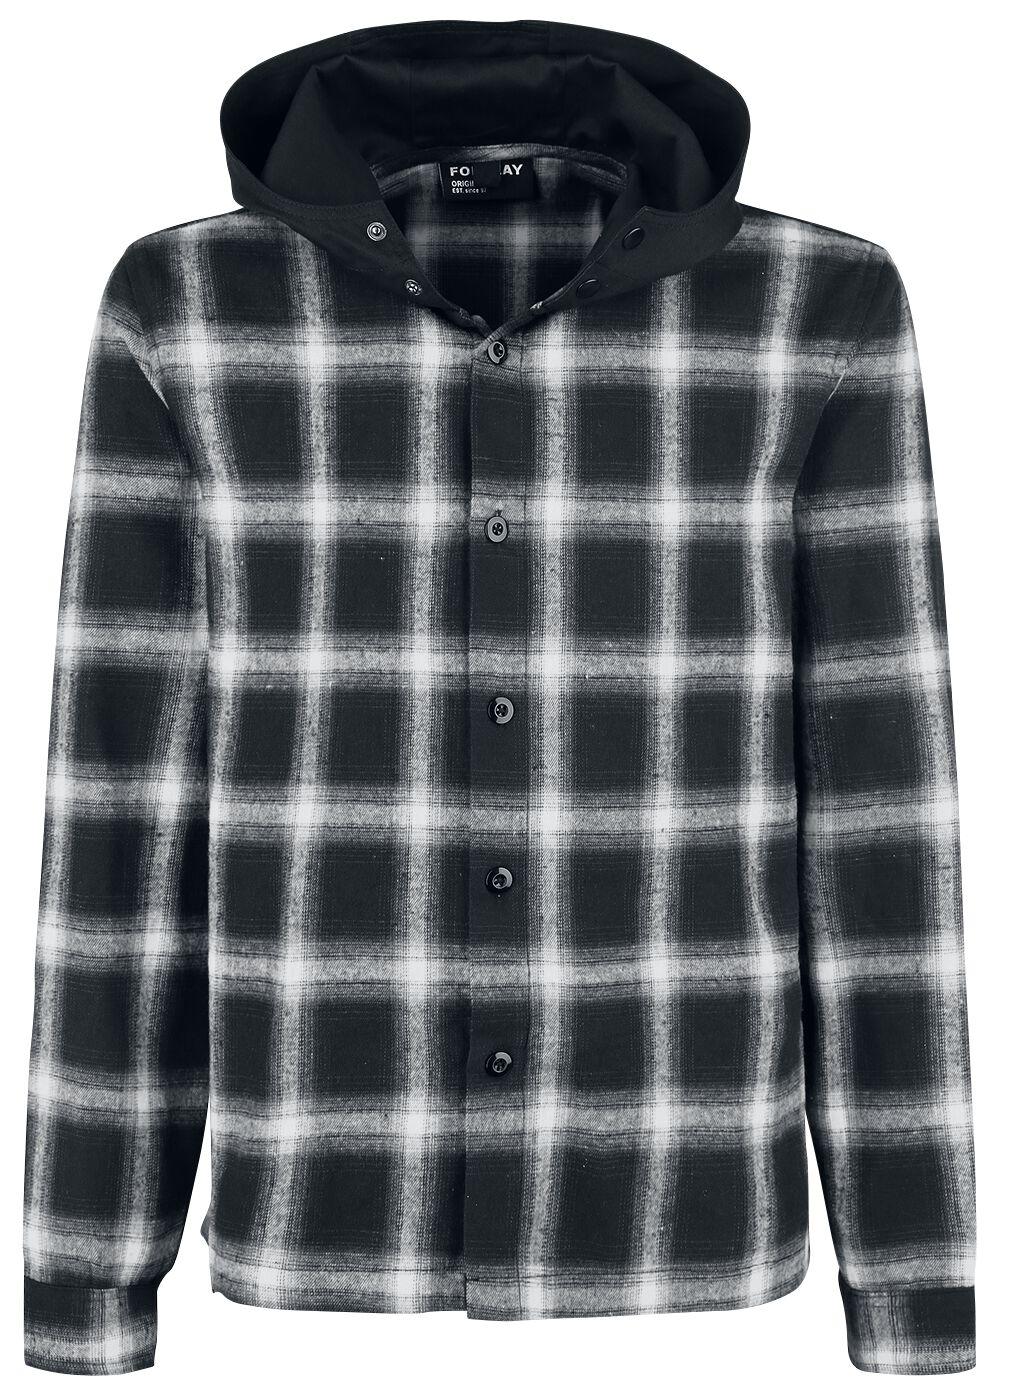 Image of   Forplay Hooded Checked Flanel Shirt Skjorte sort-hvid